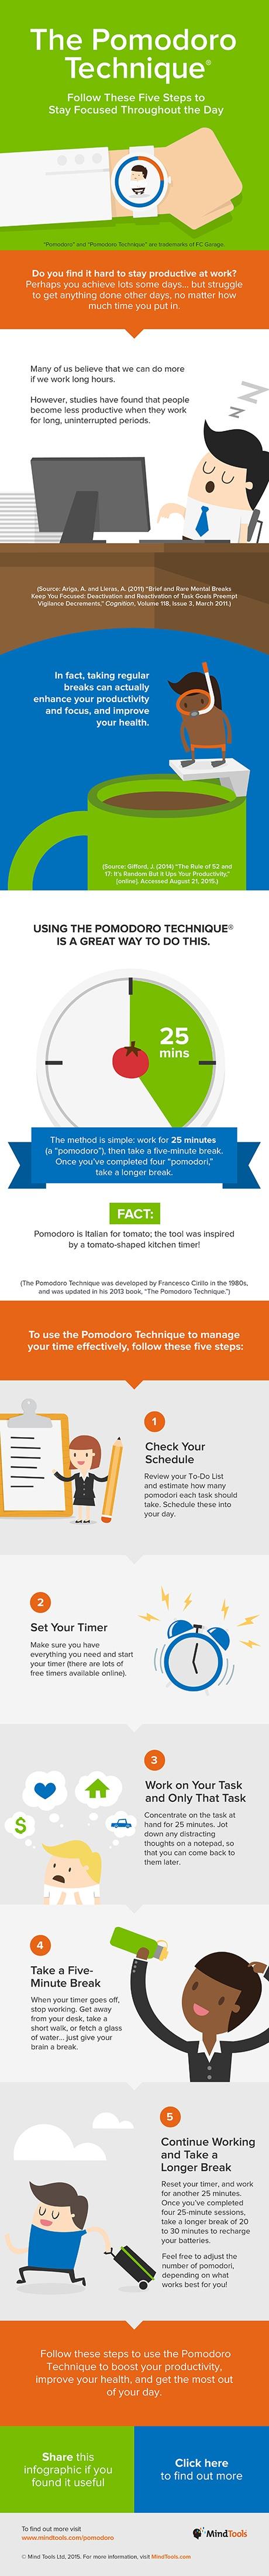 The Pomodoro Technique Infographic